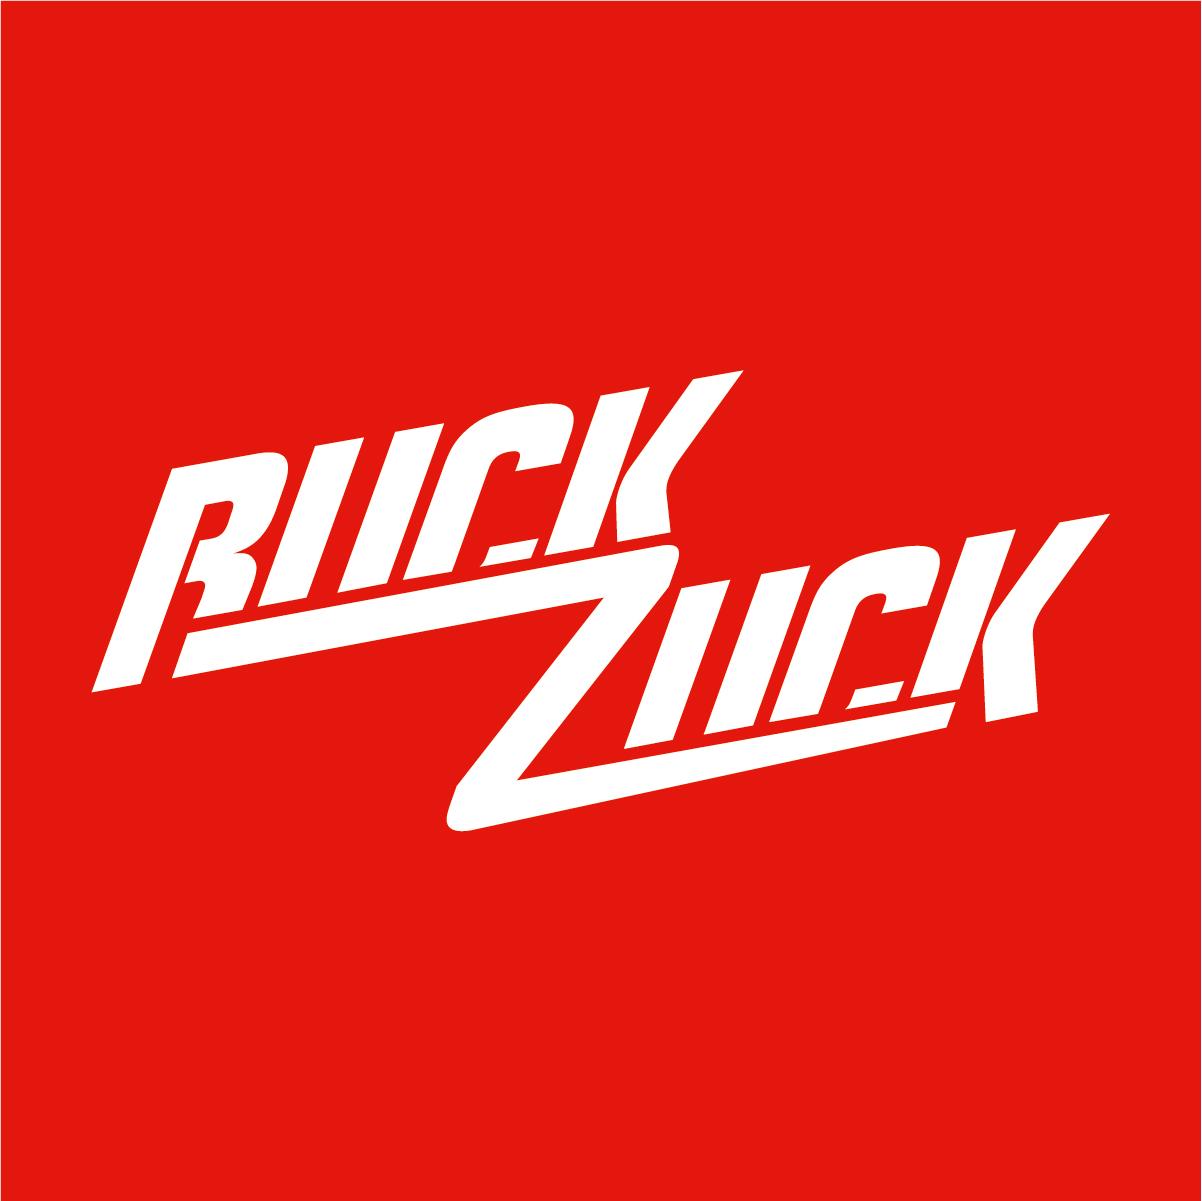 Komplettset Sono Pro Skyline Designboden 4,5mm Coffee House x-tra Langdiele